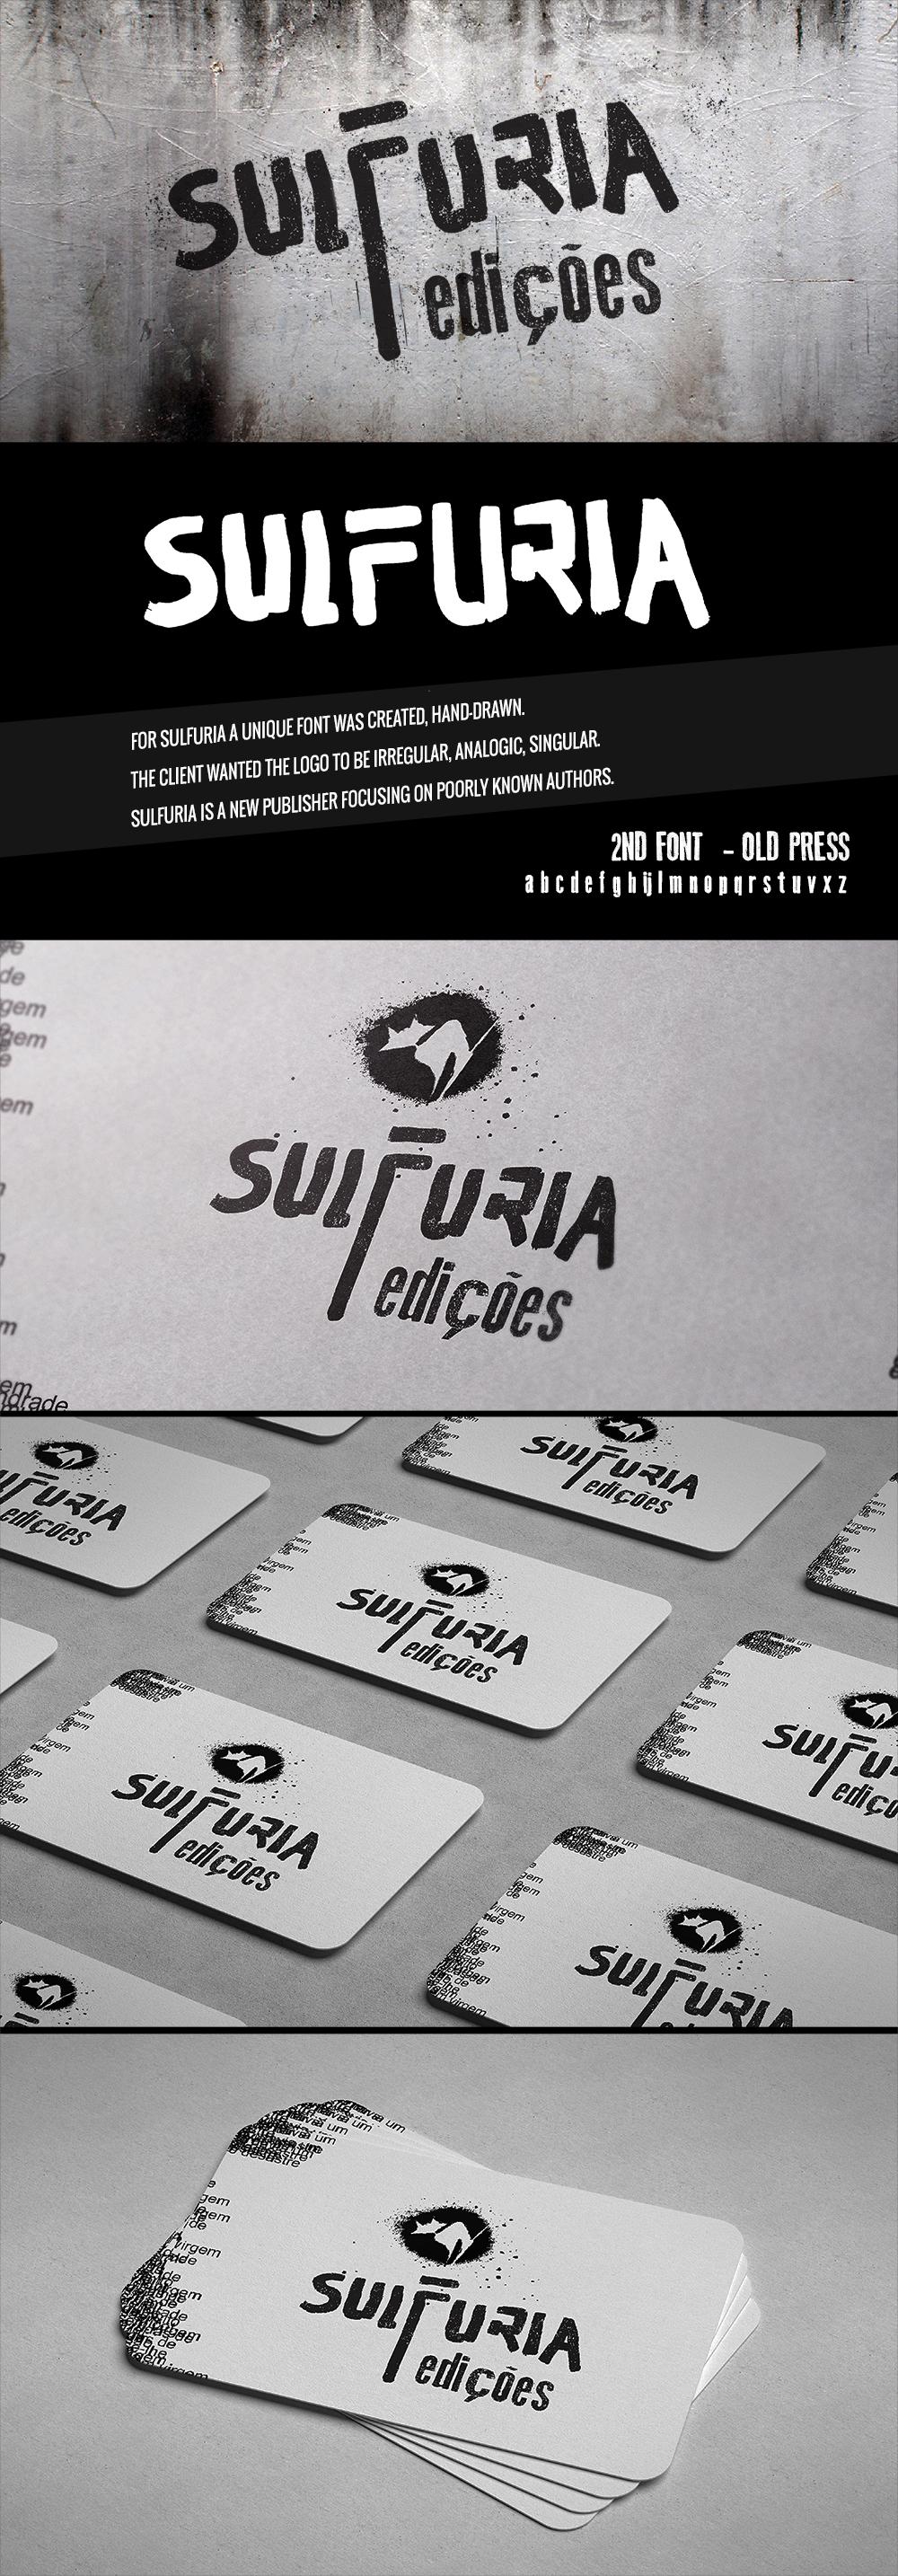 BRAND IMAGE - SULFURIA LOGO Logo Design